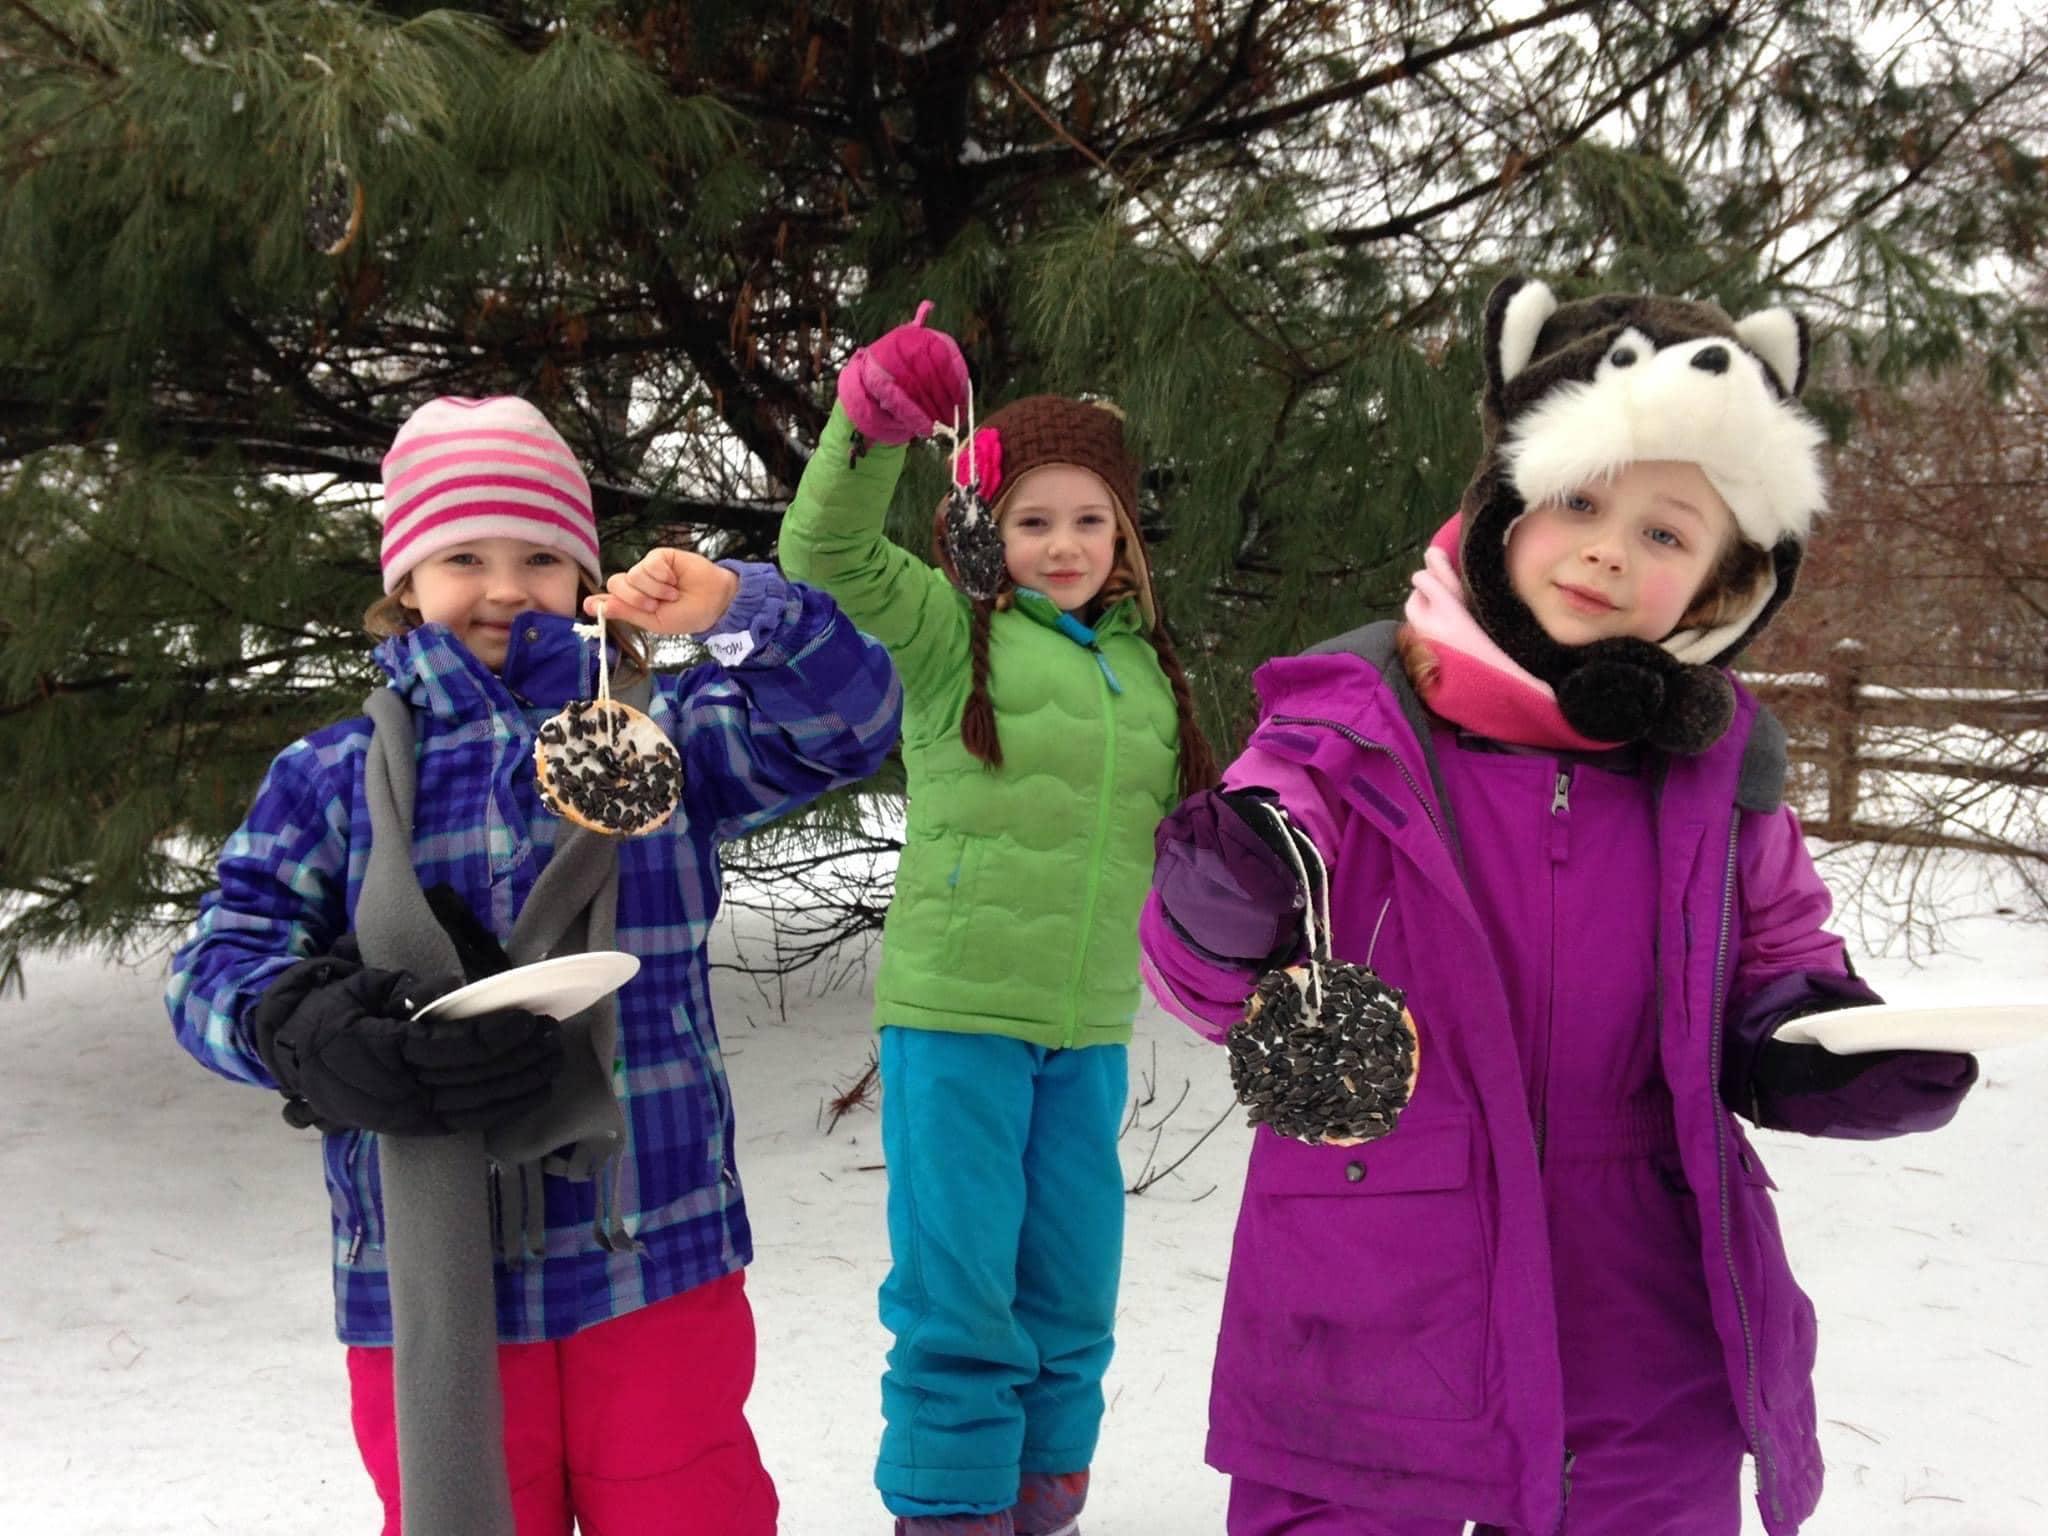 Three children holding bird feeders in the snow